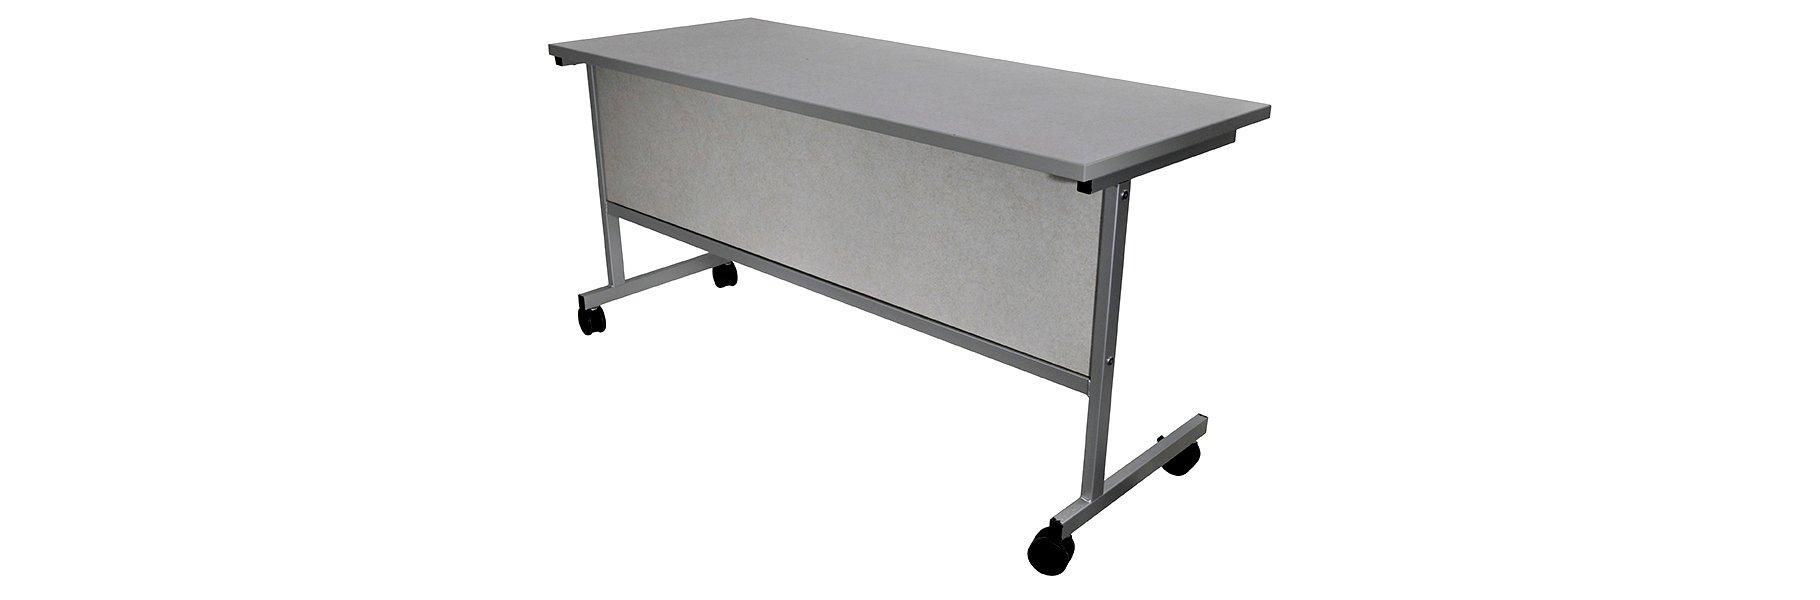 Corilam 613 Mobile Steel Base Desk Front.jpg